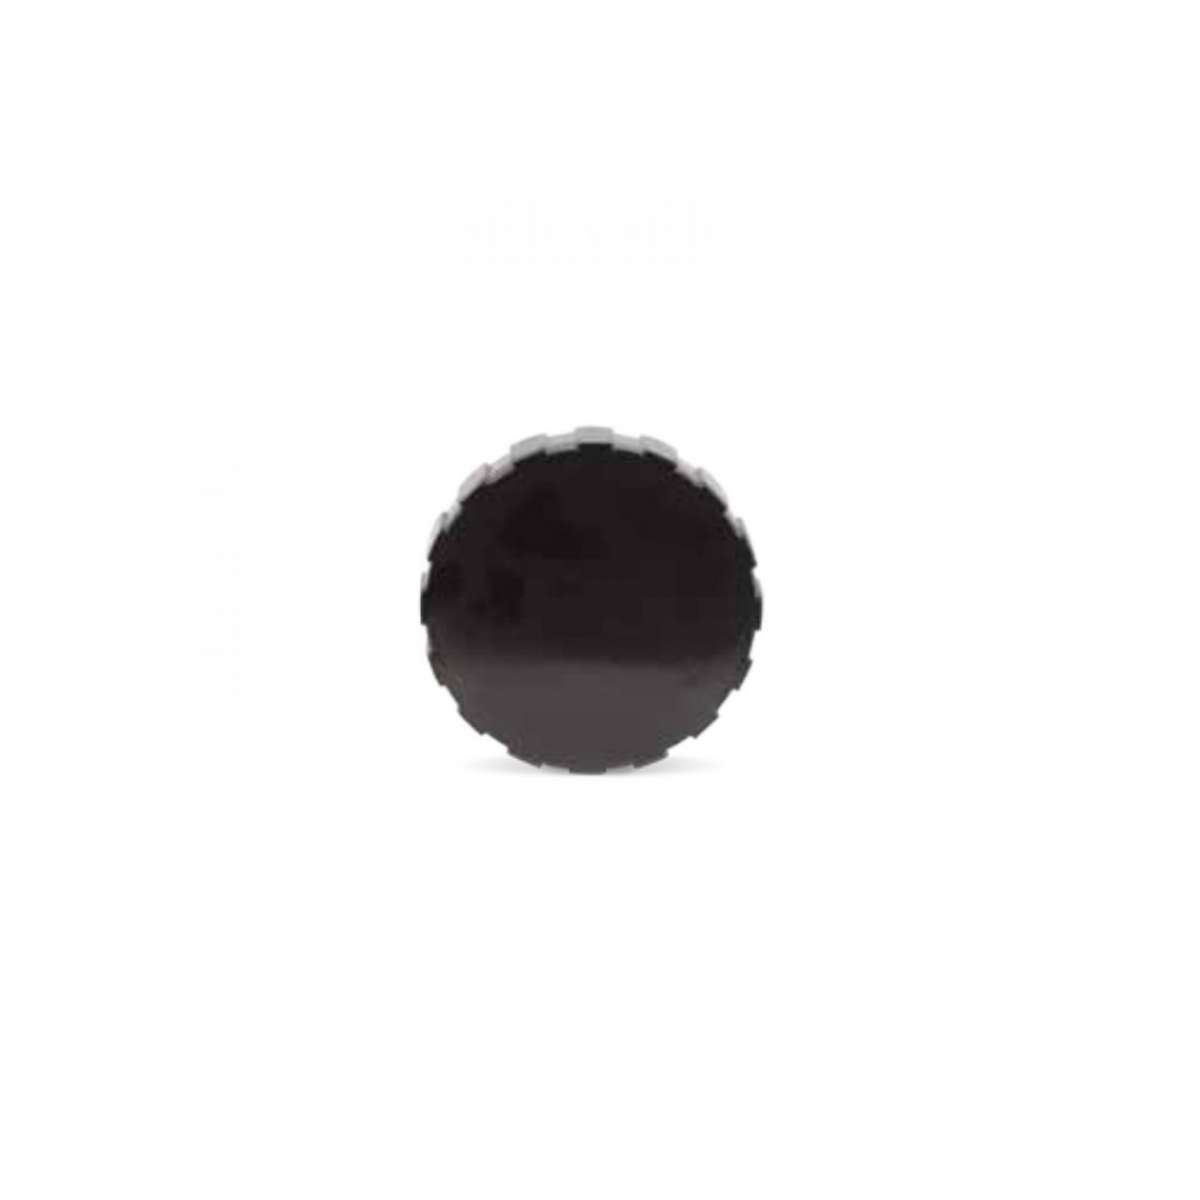 Des Case Isolink Pump Lid Cap Black